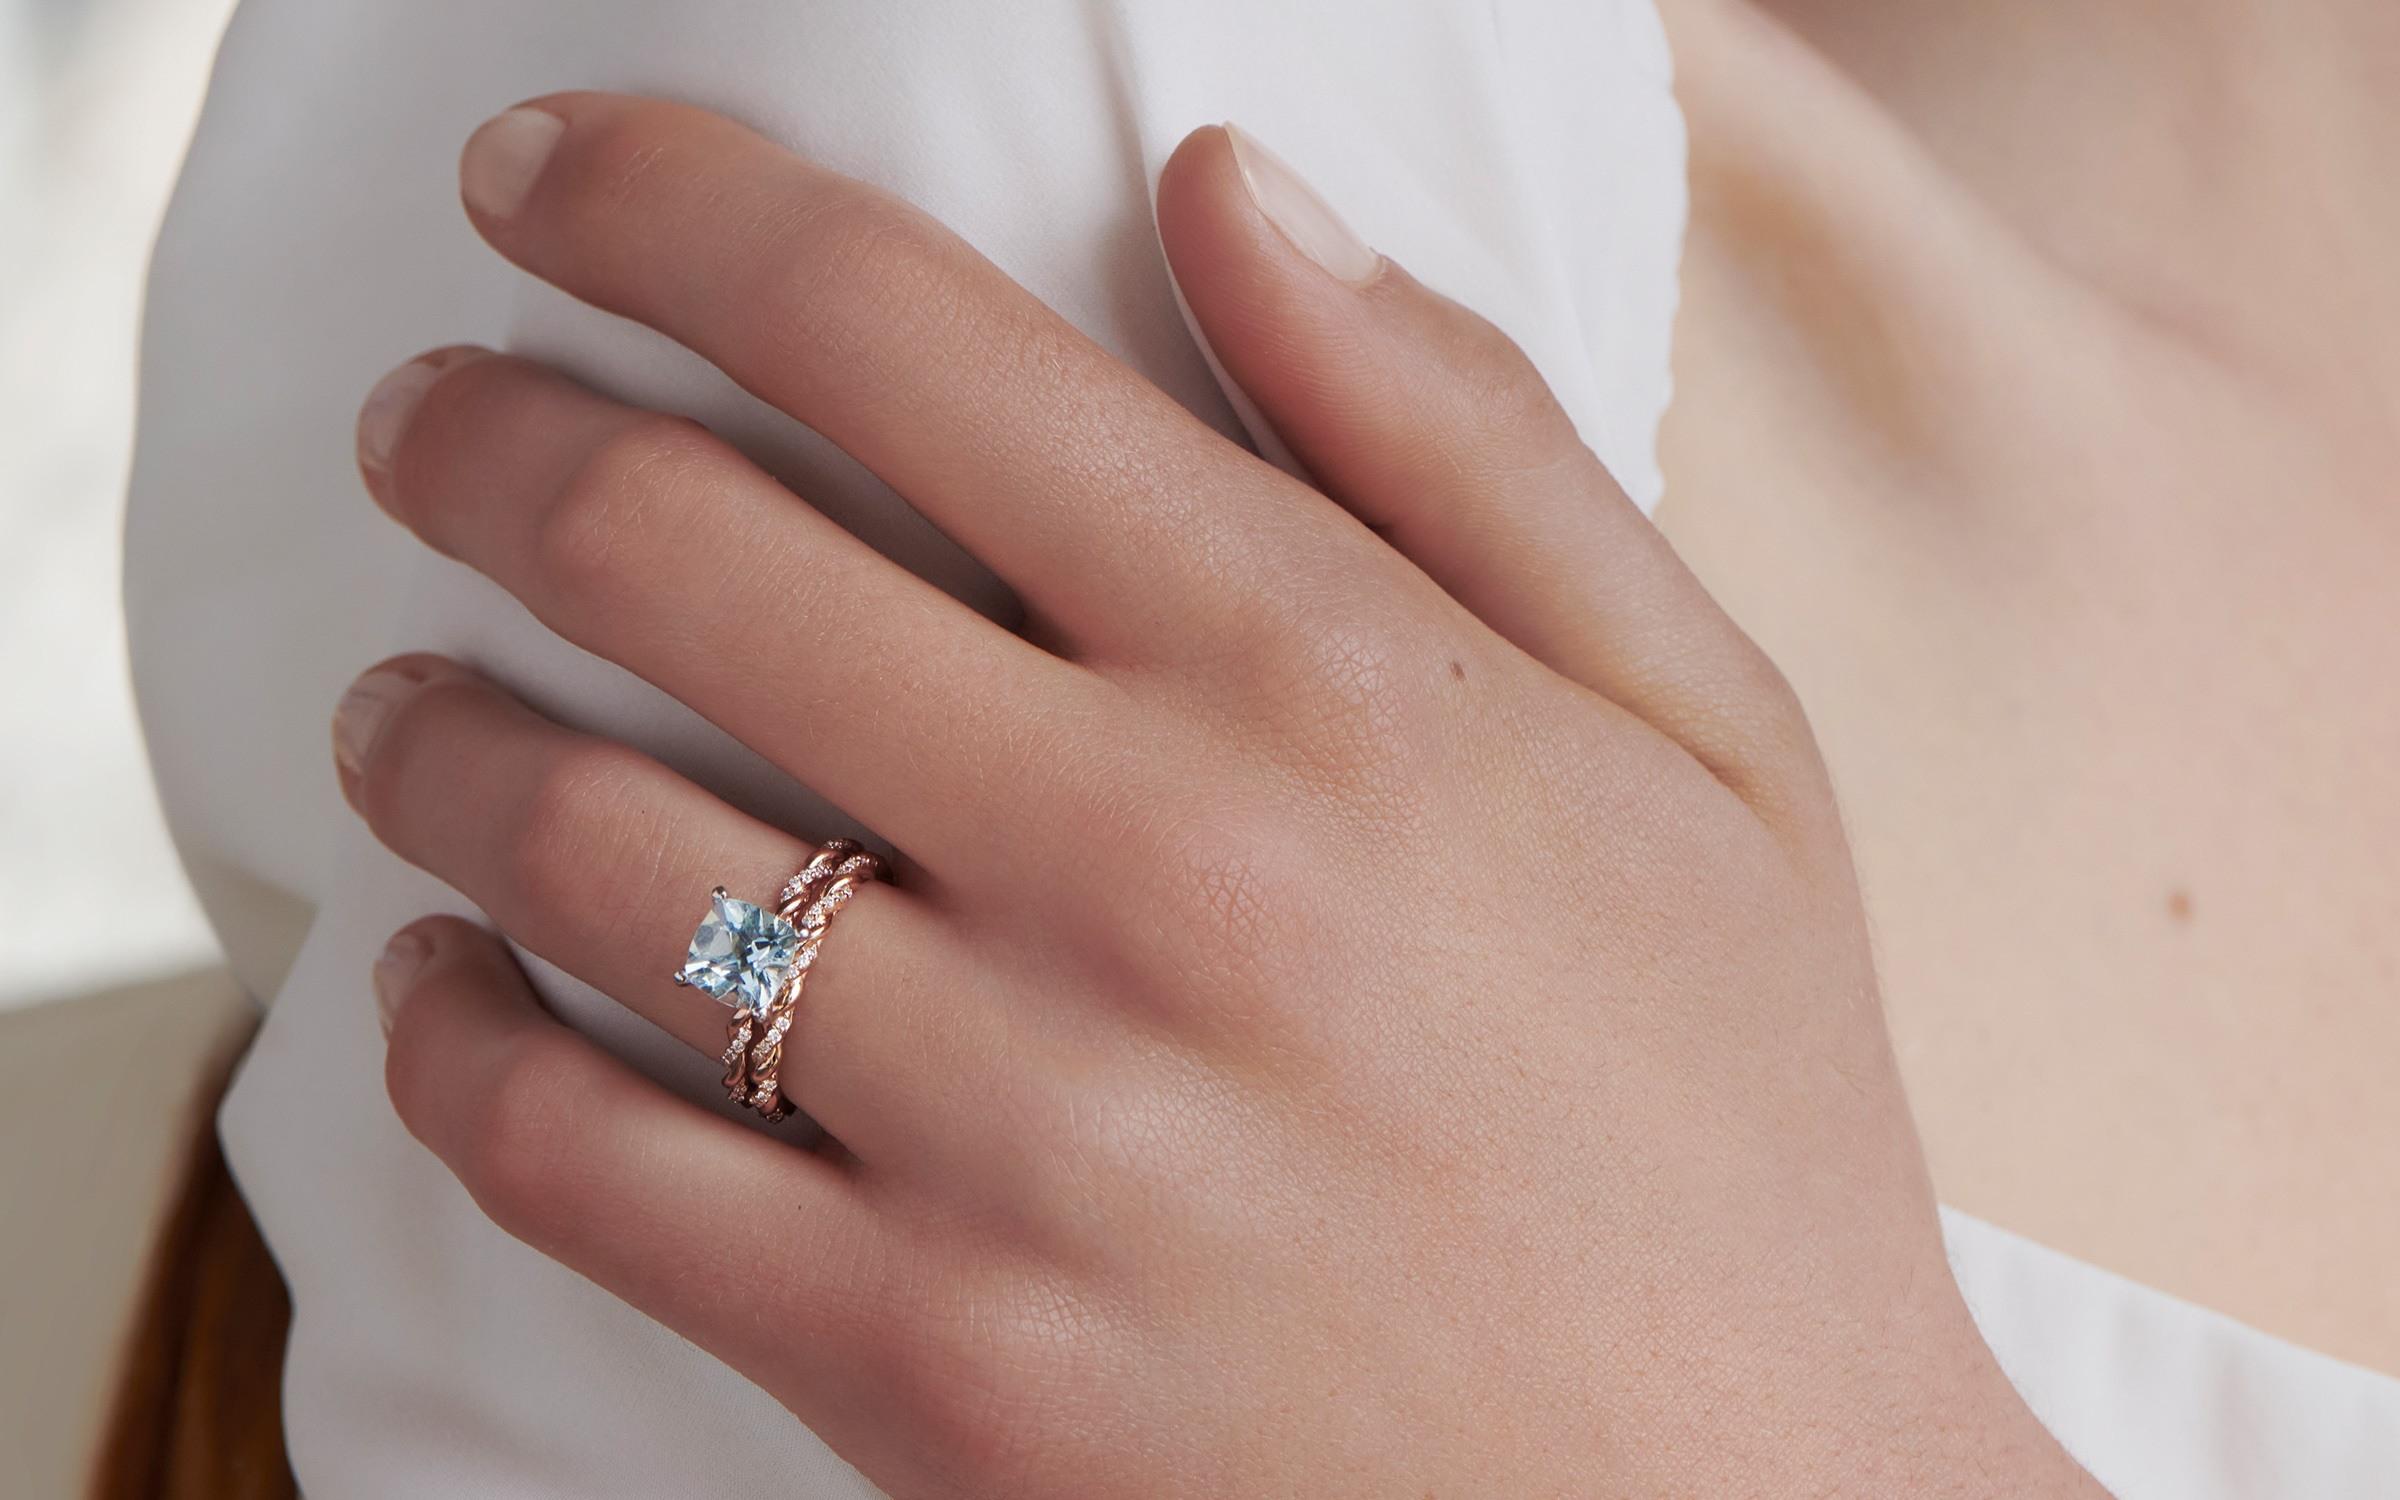 Woman wearing aquamarine engagement ring with rose gold wedding band.